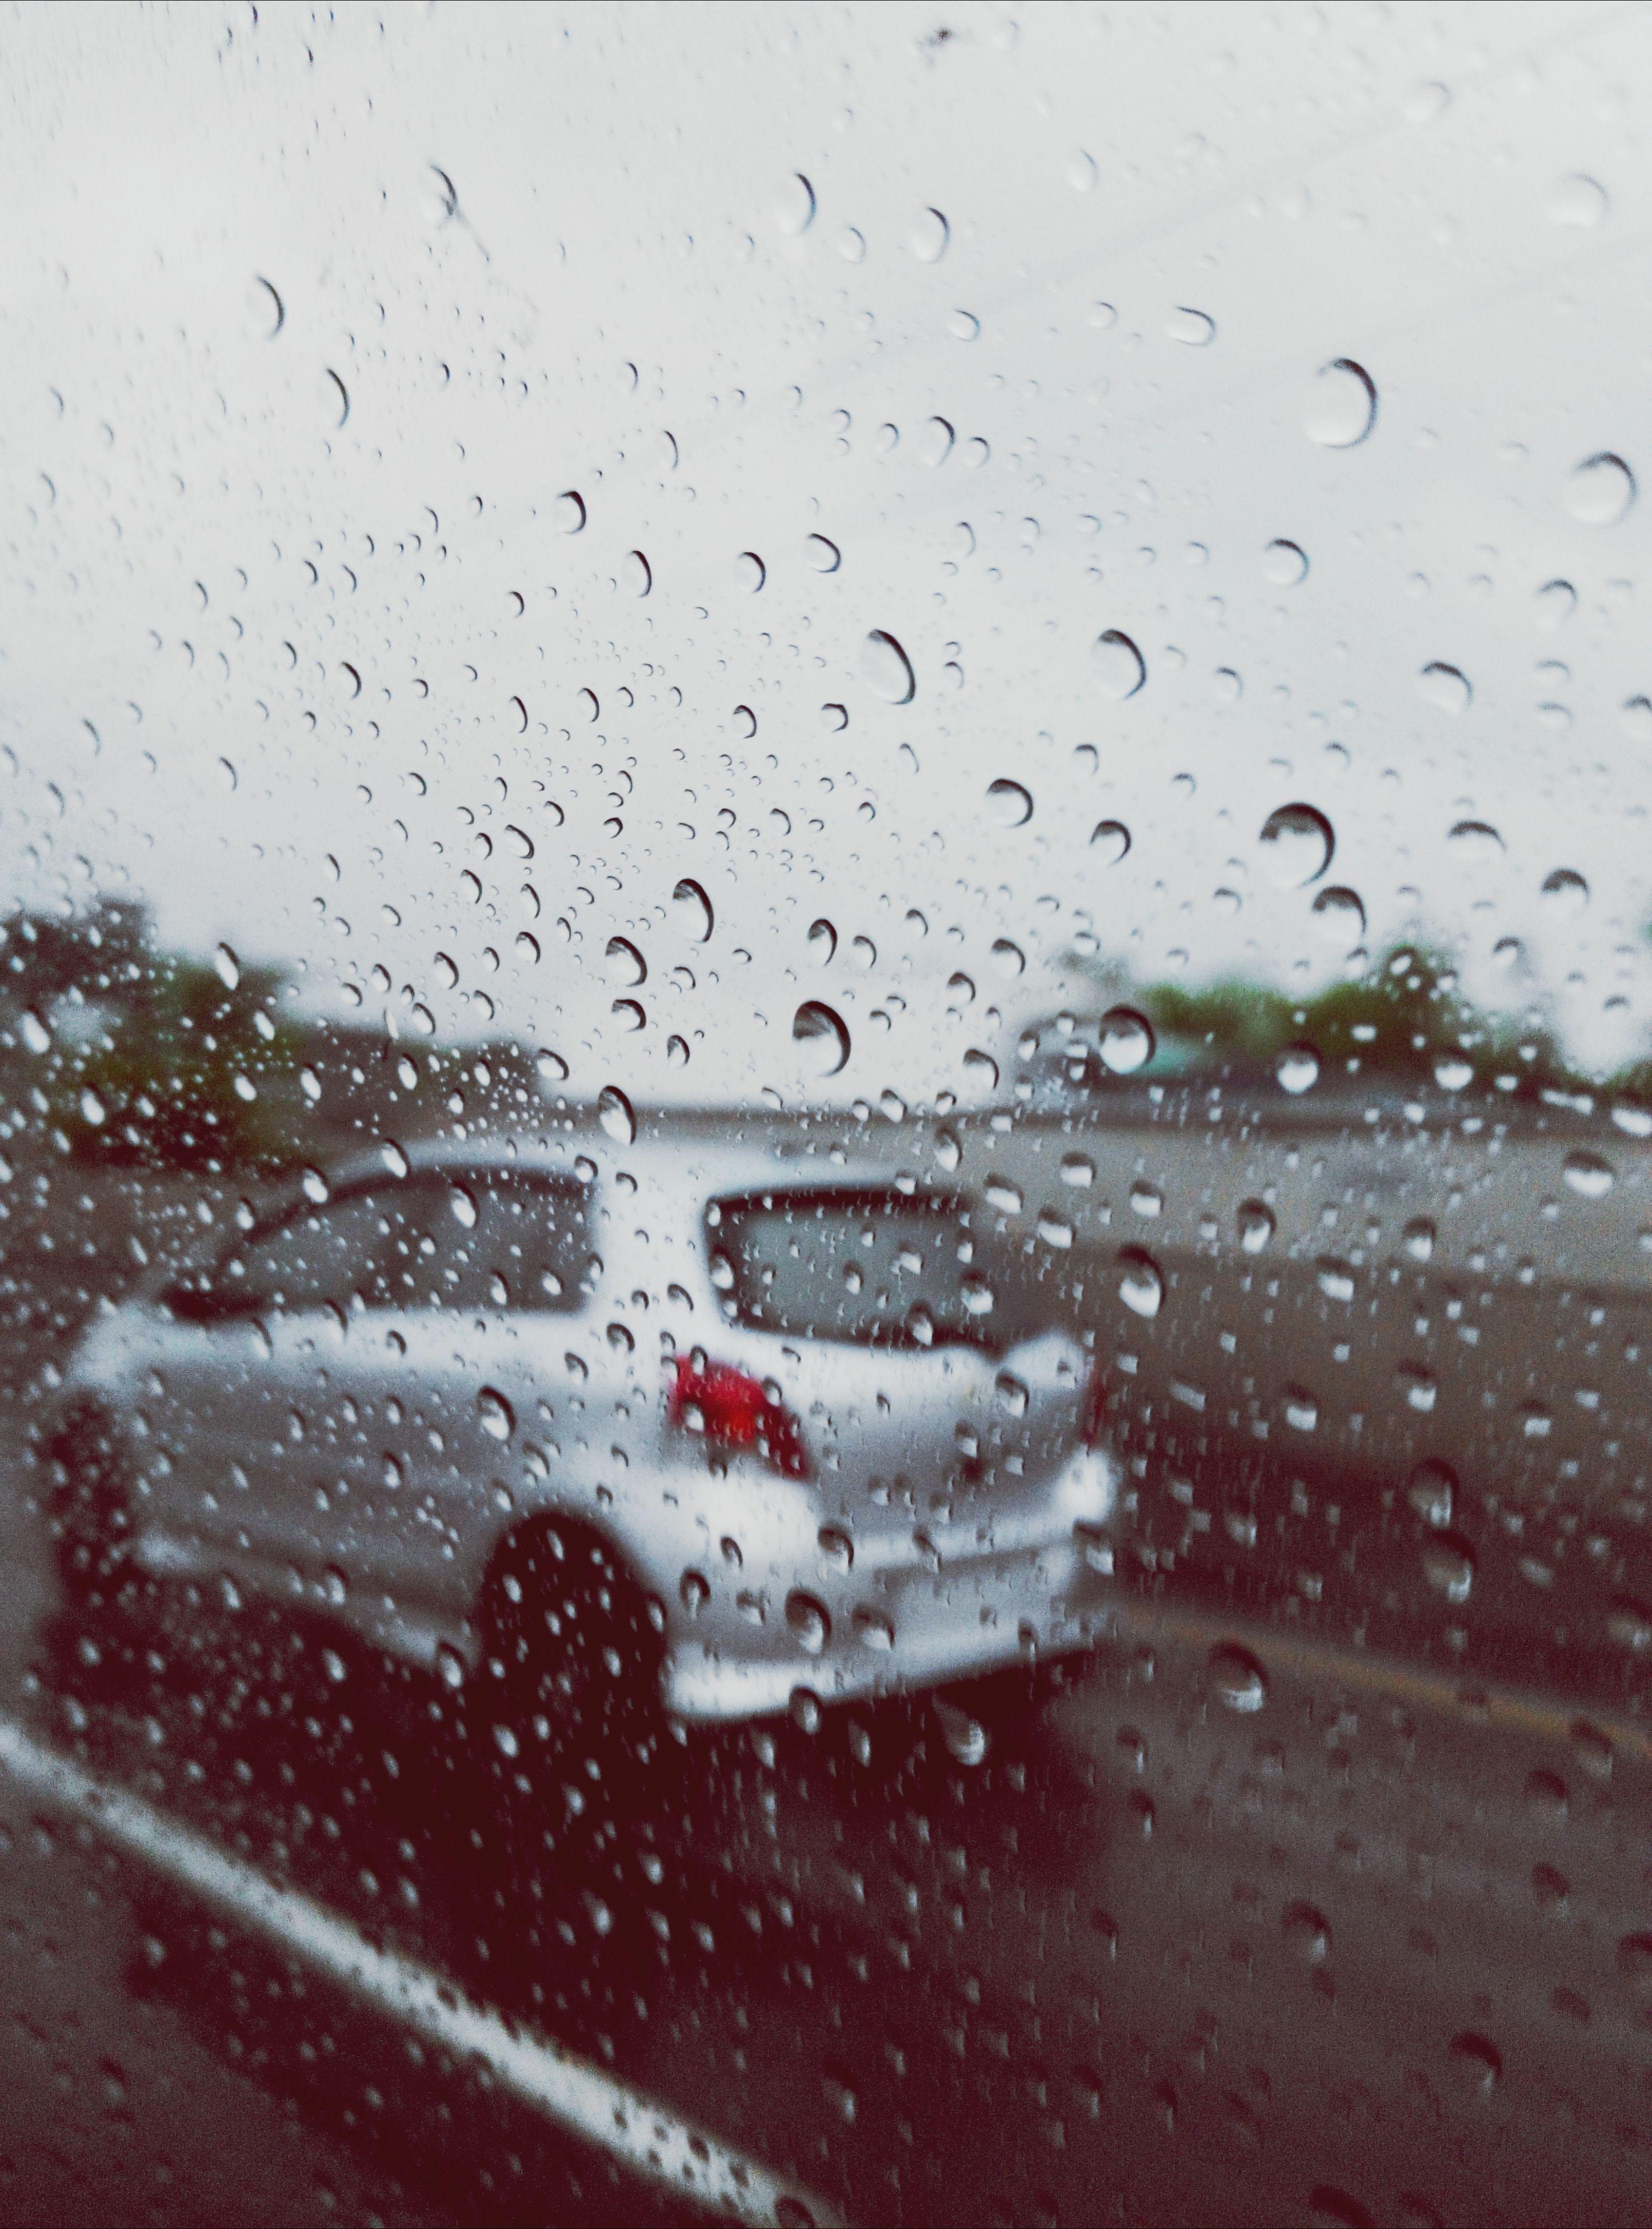 wet, drop, window, rain, transportation, transparent, glass - material, weather, season, water, mode of transport, car, vehicle interior, indoors, raindrop, land vehicle, sky, car interior, windshield, road